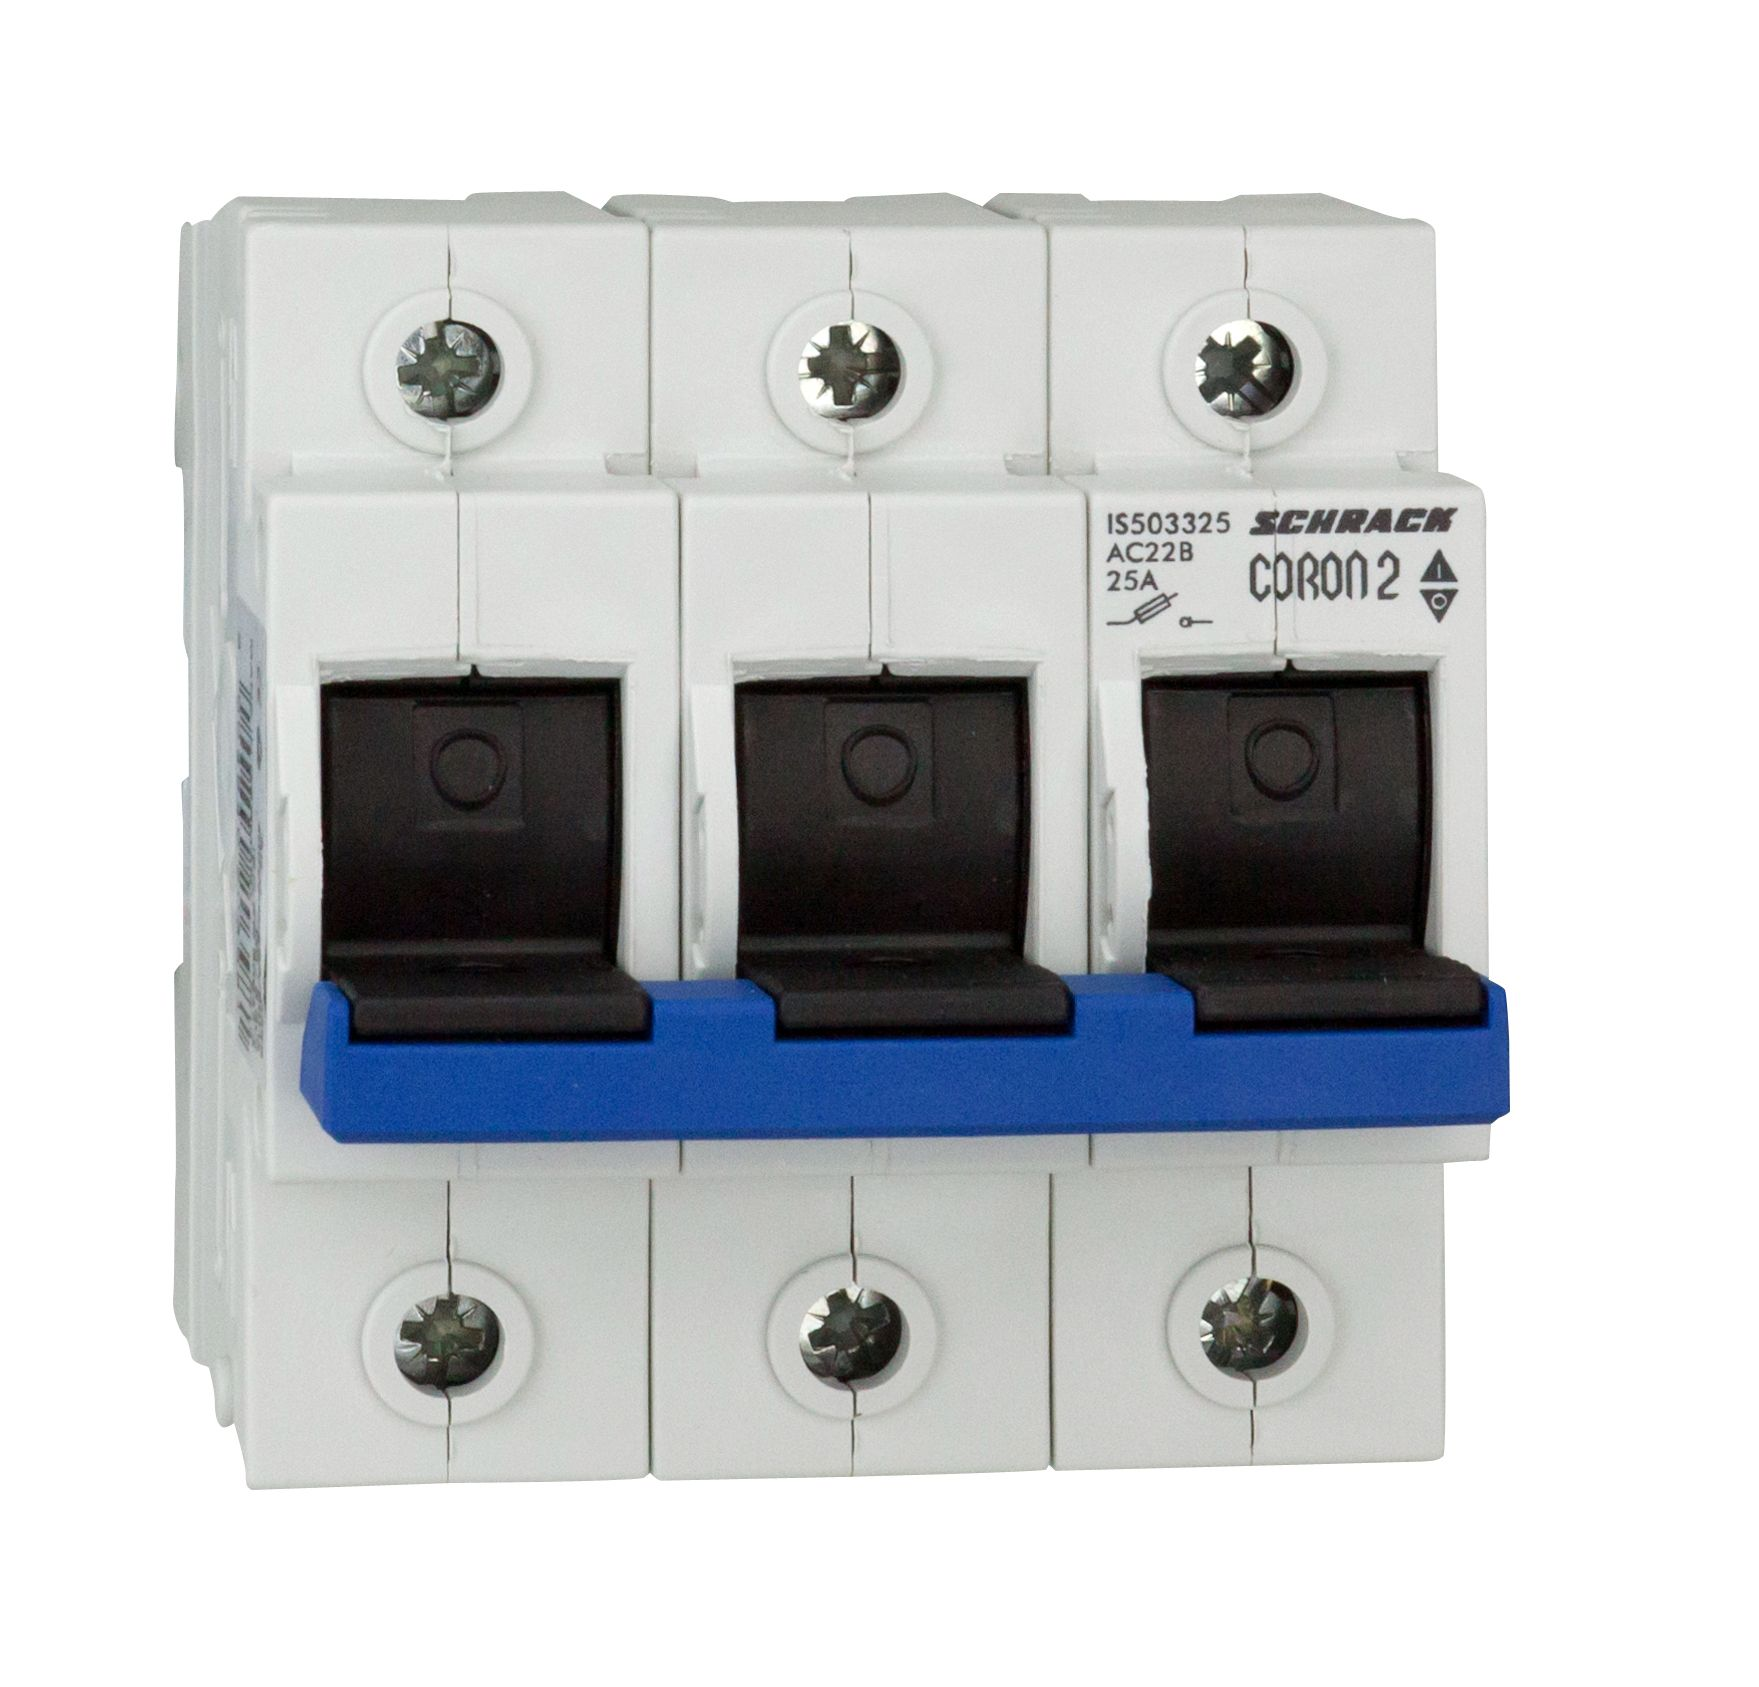 1 Stk CORON 2, D02-Sicherungslasttrenschalter, 3-polig 25A IS503325--